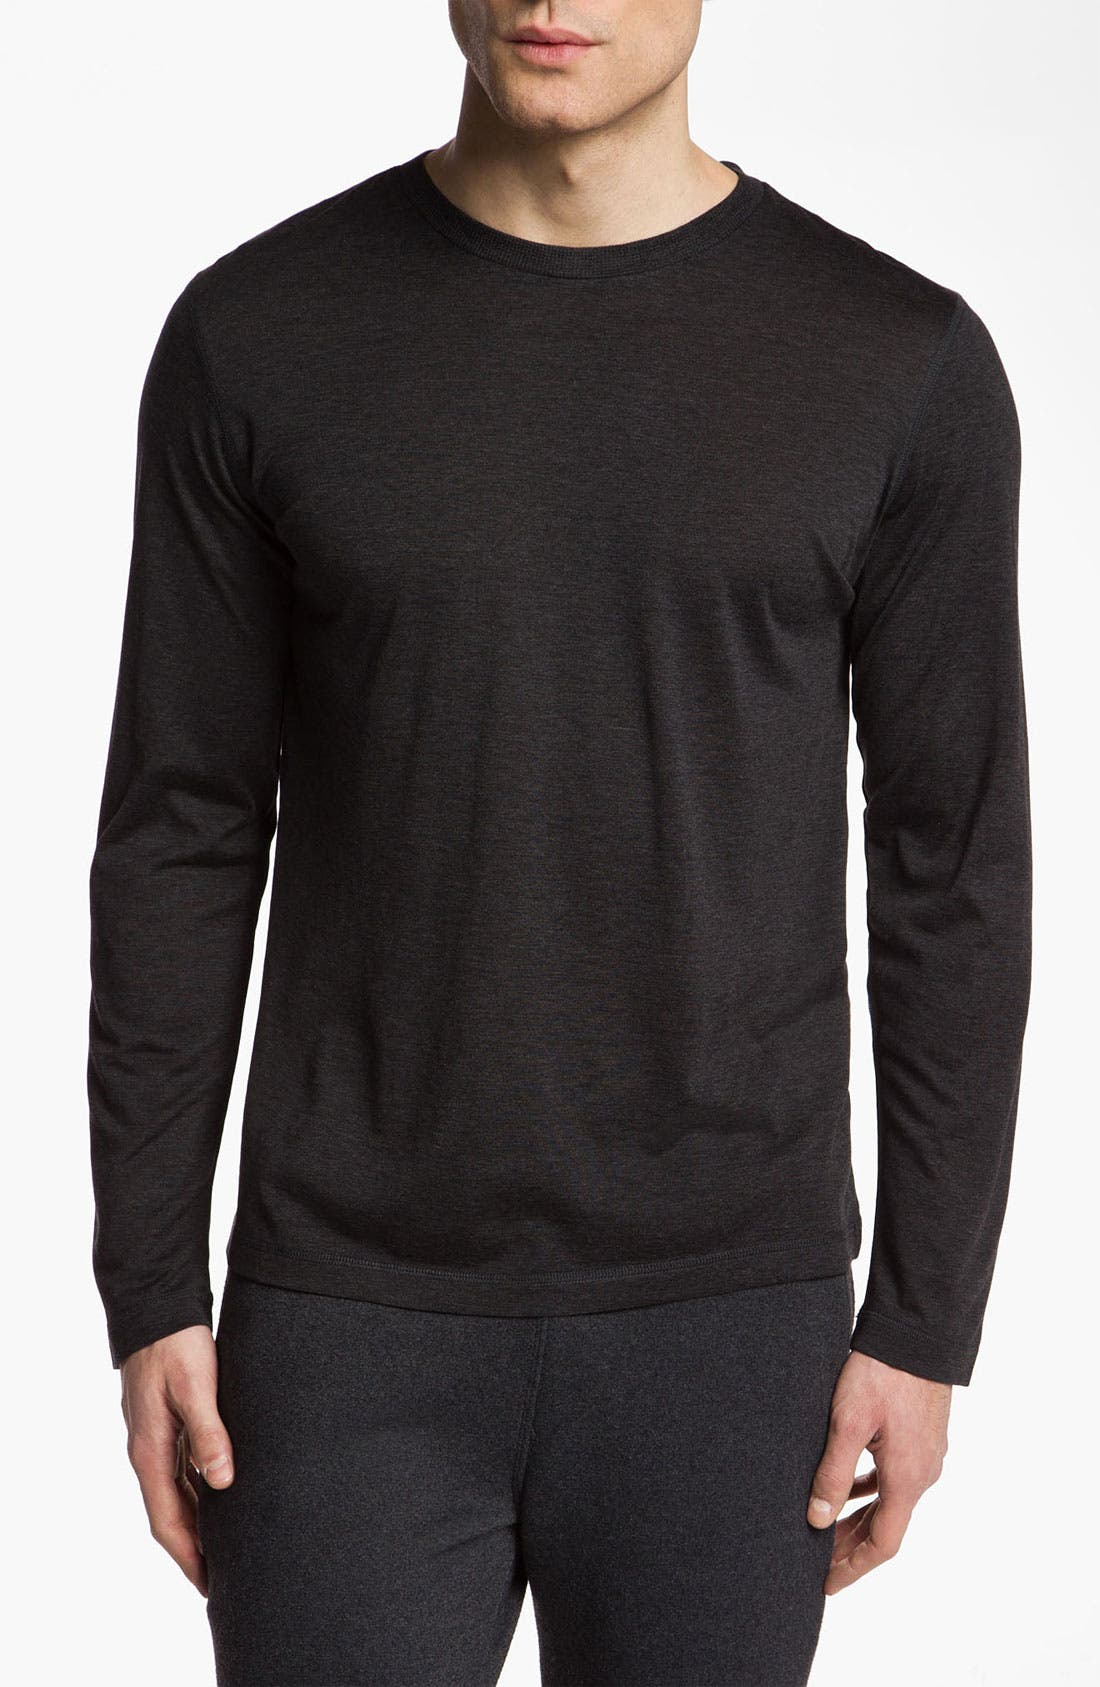 Alternate Image 1 Selected - Daniel Buchler Silk & Cotton Long Sleeve T-Shirt